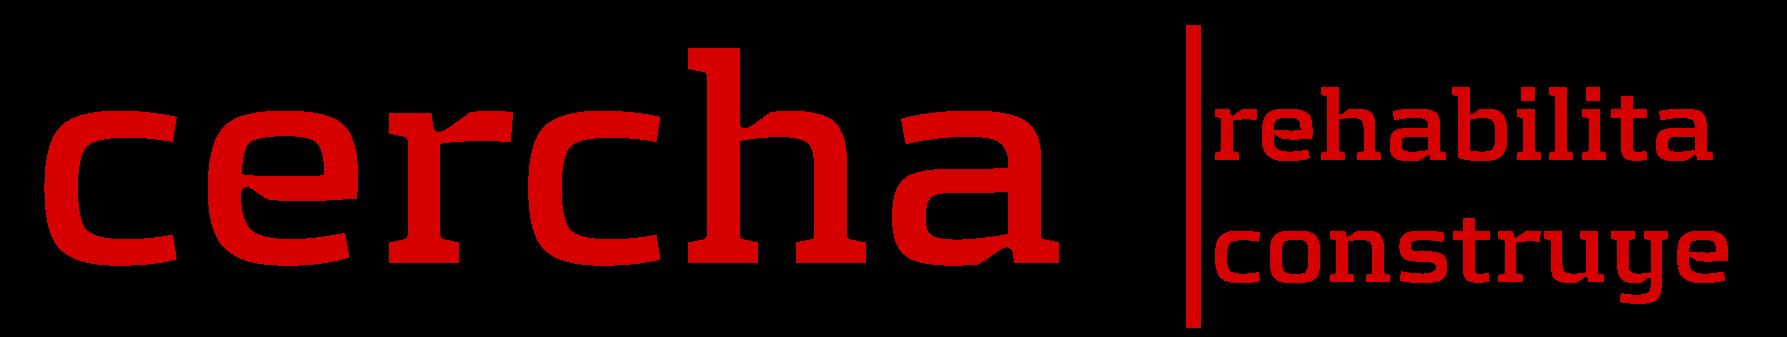 Cercha